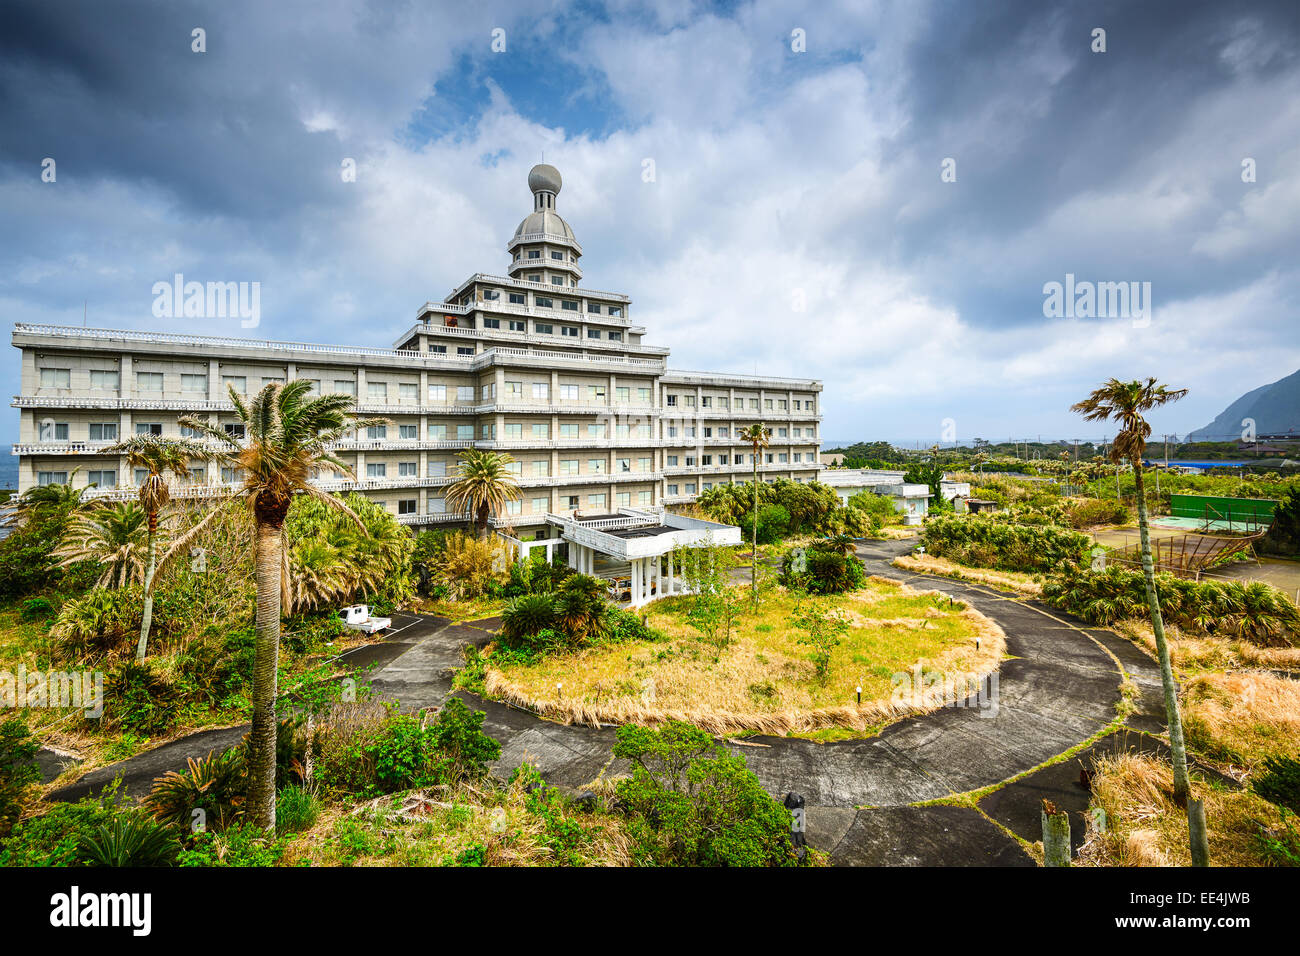 Abandoned Hotel Building Ruins On Hachijojima Island